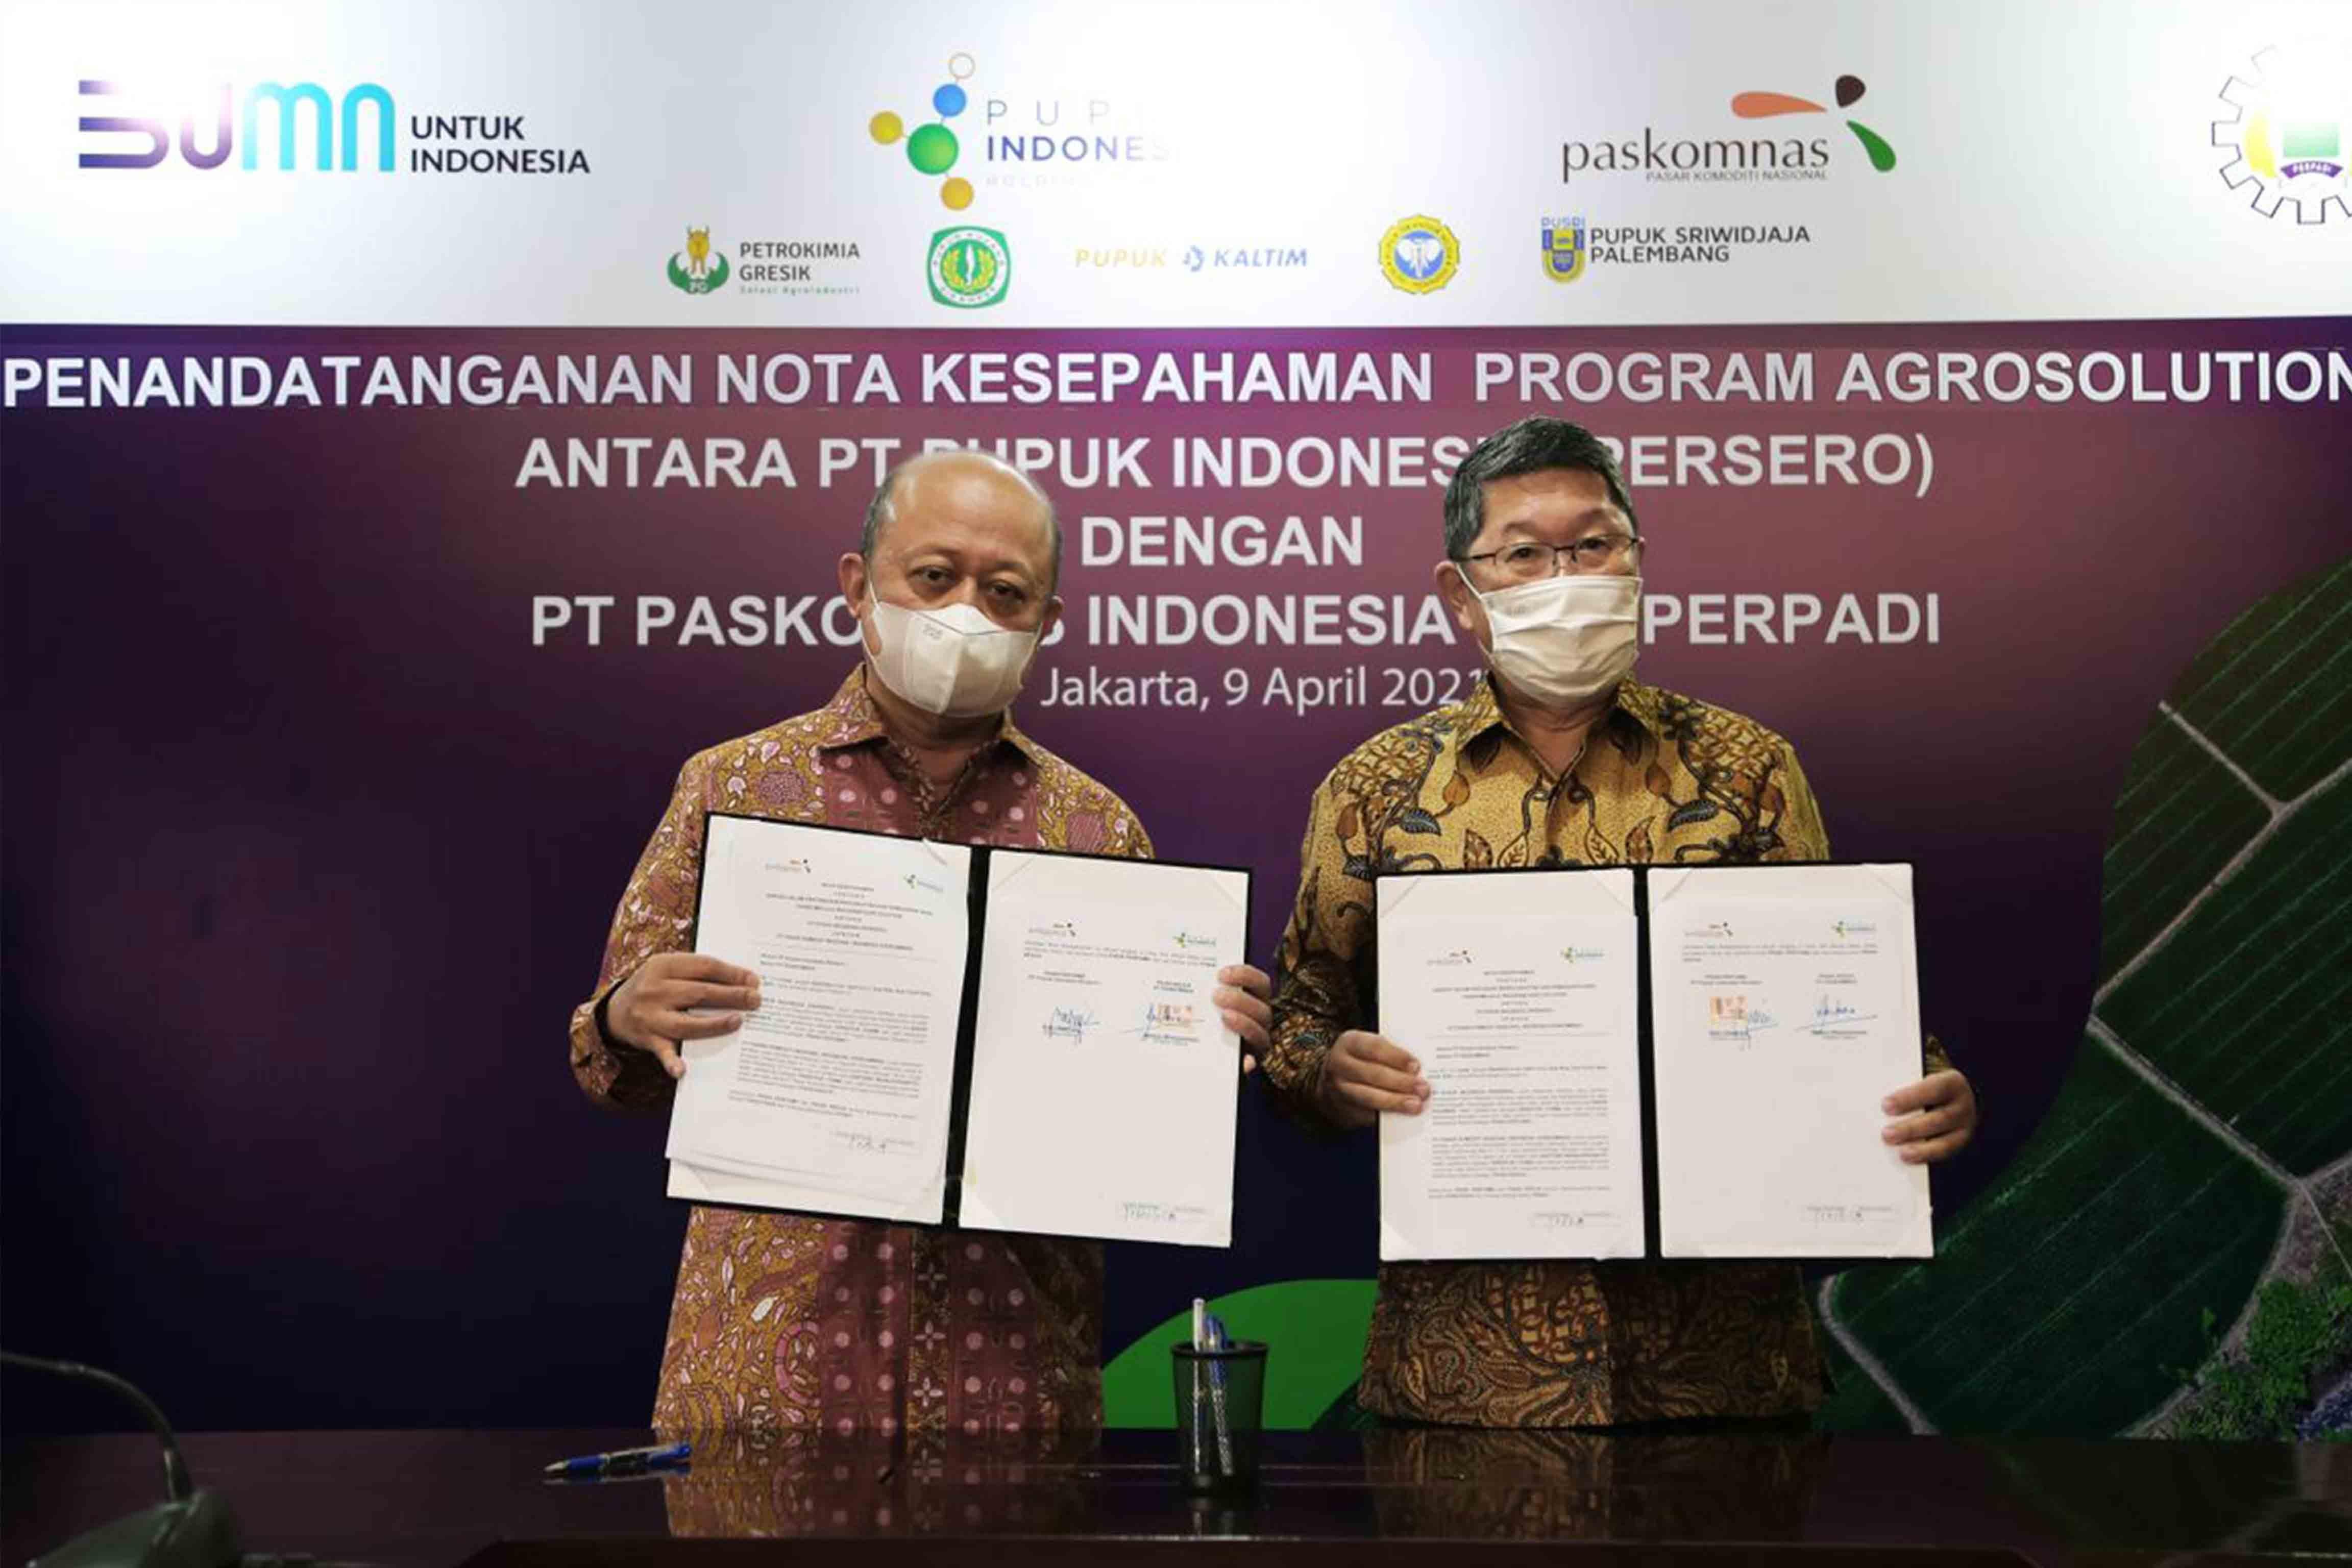 Penandatanganan Nota Kesepahaman Program Agrosolution antara PT Pupuk Indonesia (Persero) Dengan PT Paskomnas Indonesia daan Perpadi, 2021